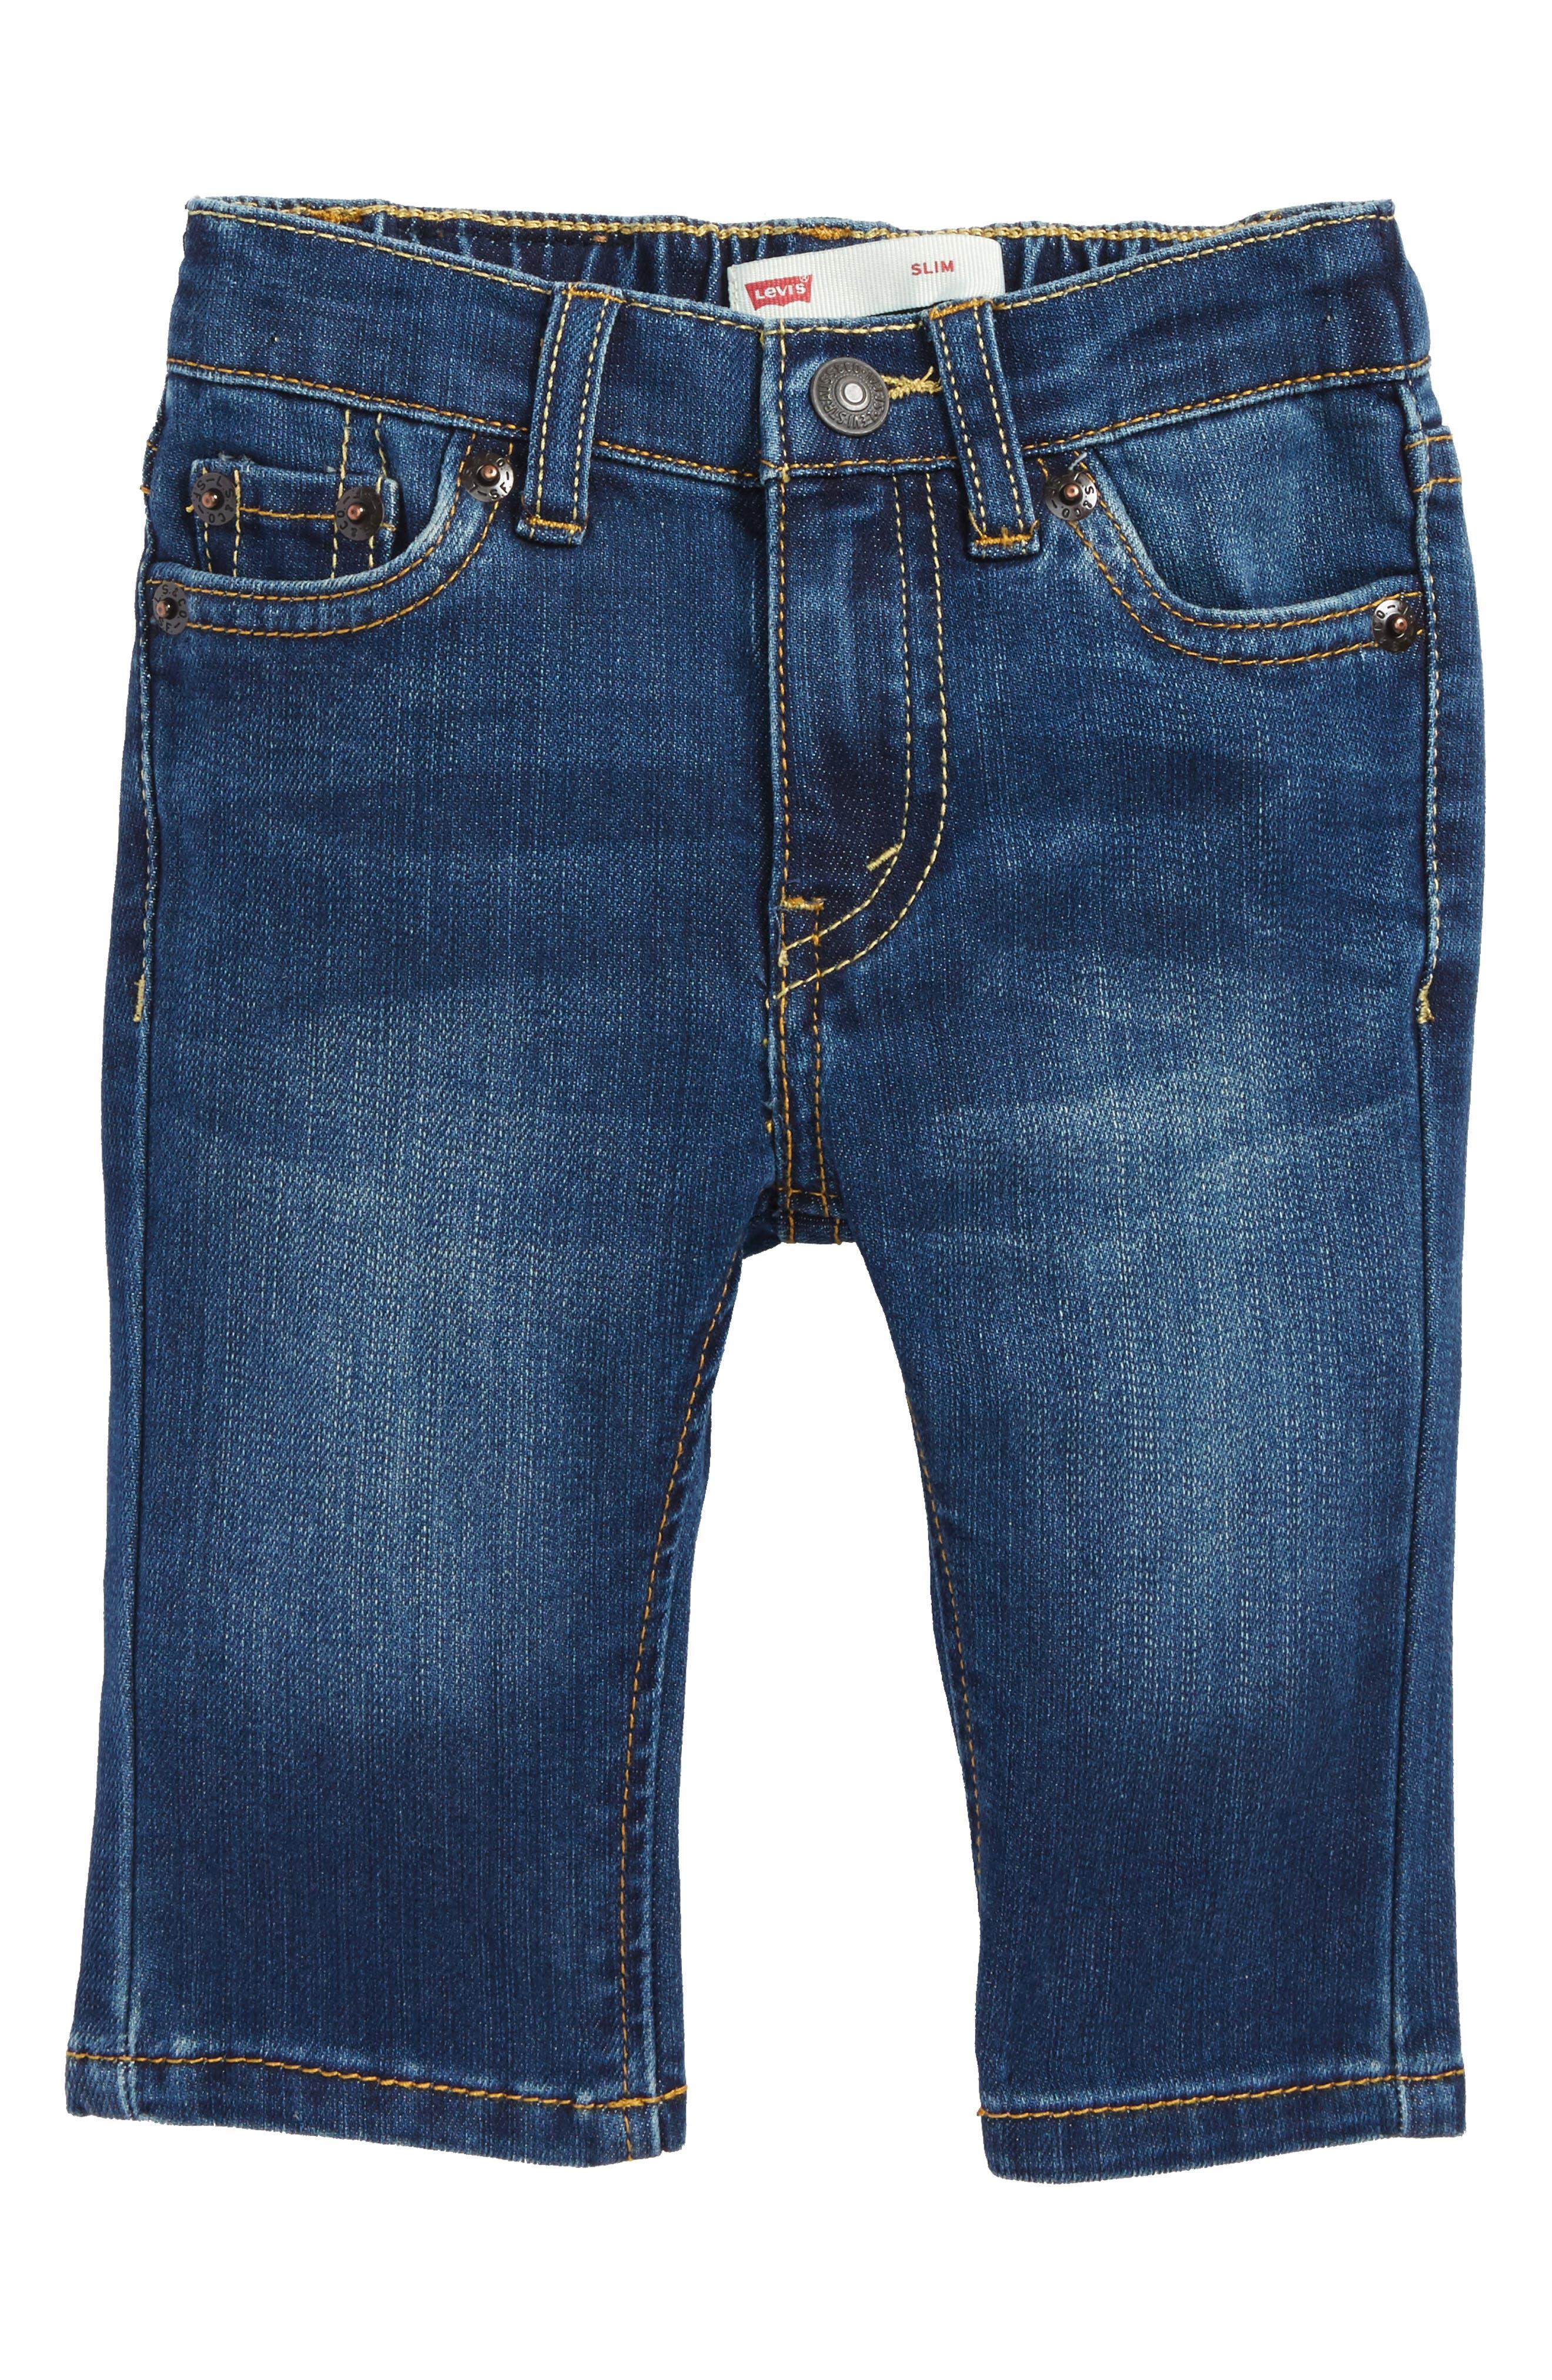 Comfort Slim Fit Jeans,                         Main,                         color, 422